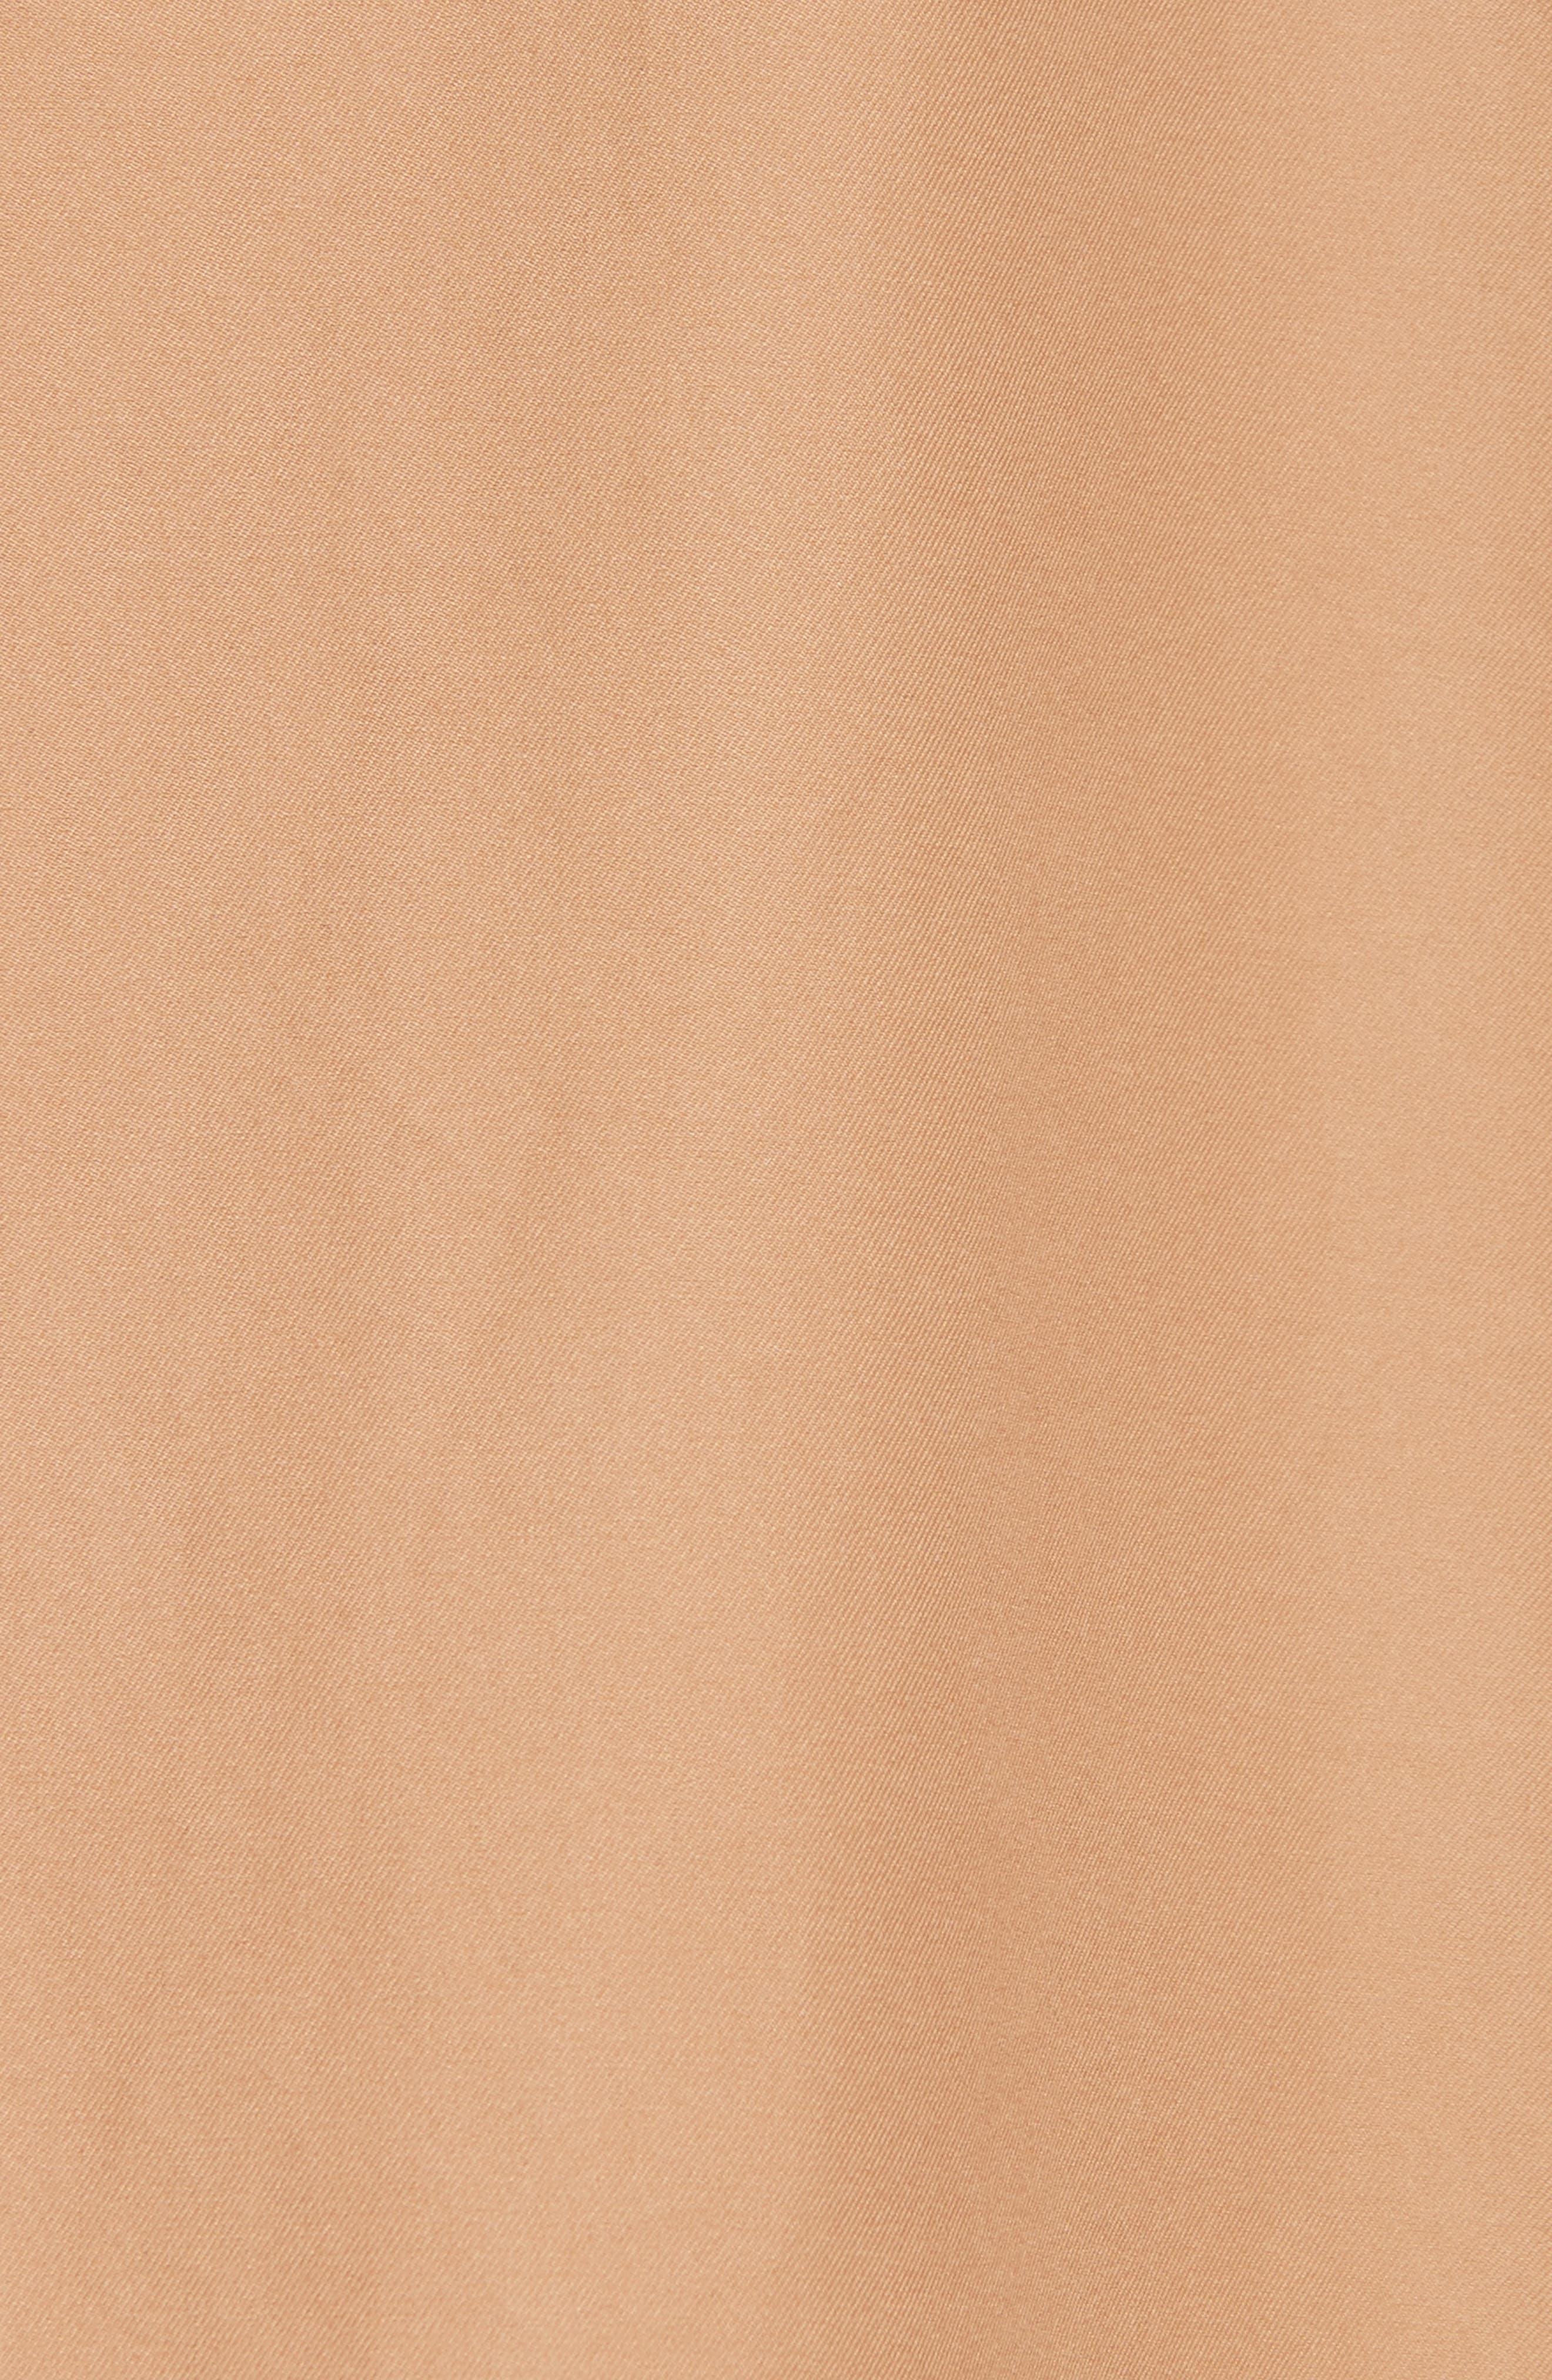 Eleta Short Trench Coat,                             Alternate thumbnail 6, color,                             206